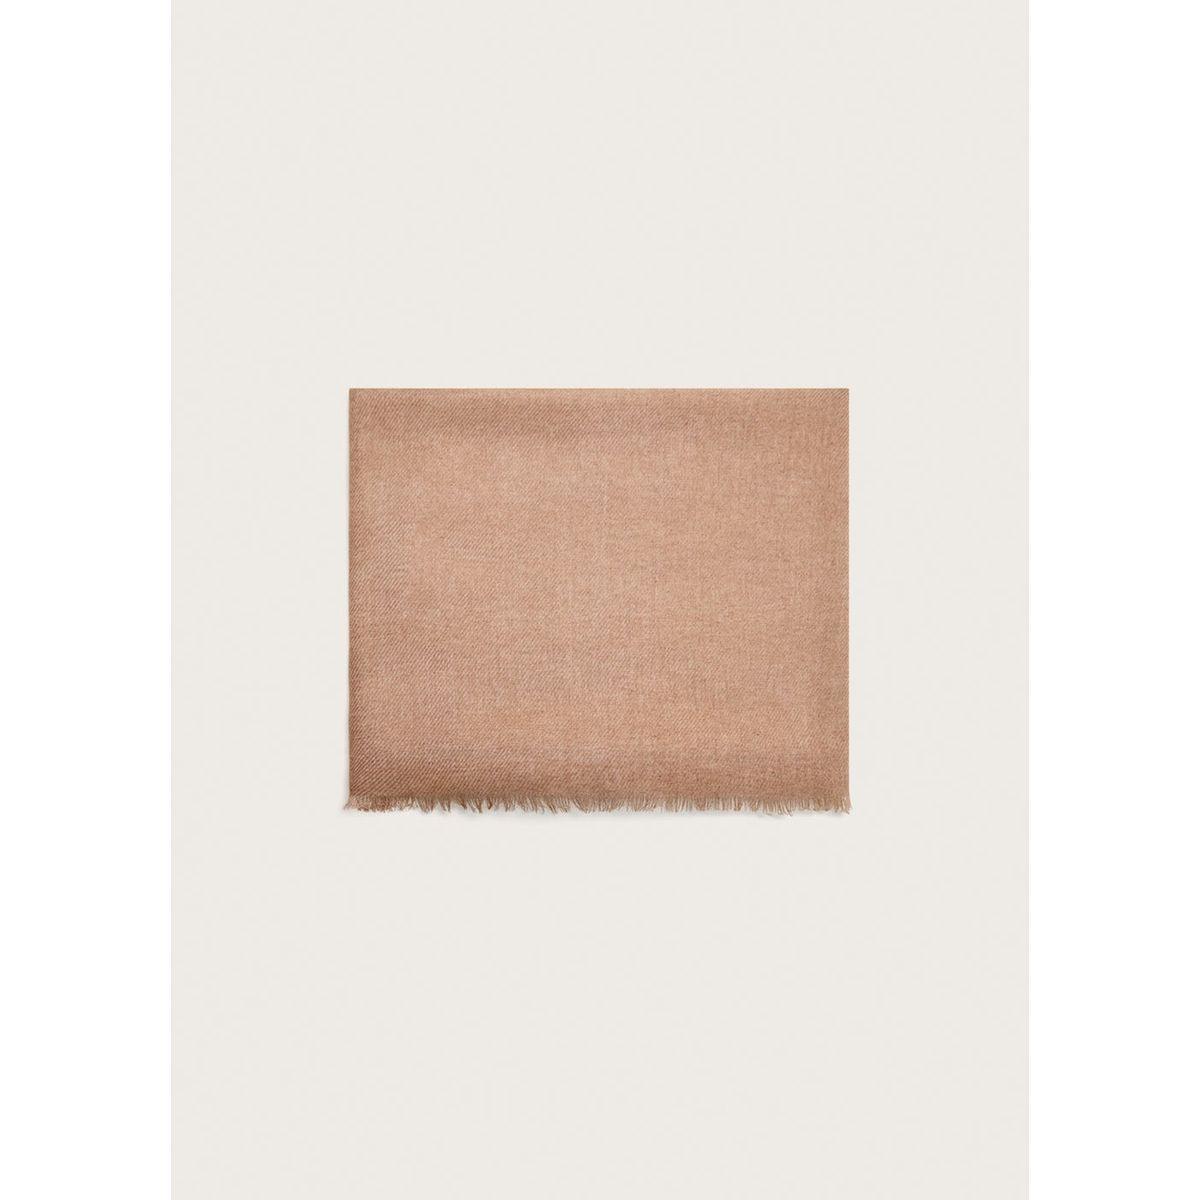 Foulard bicolore dégradé